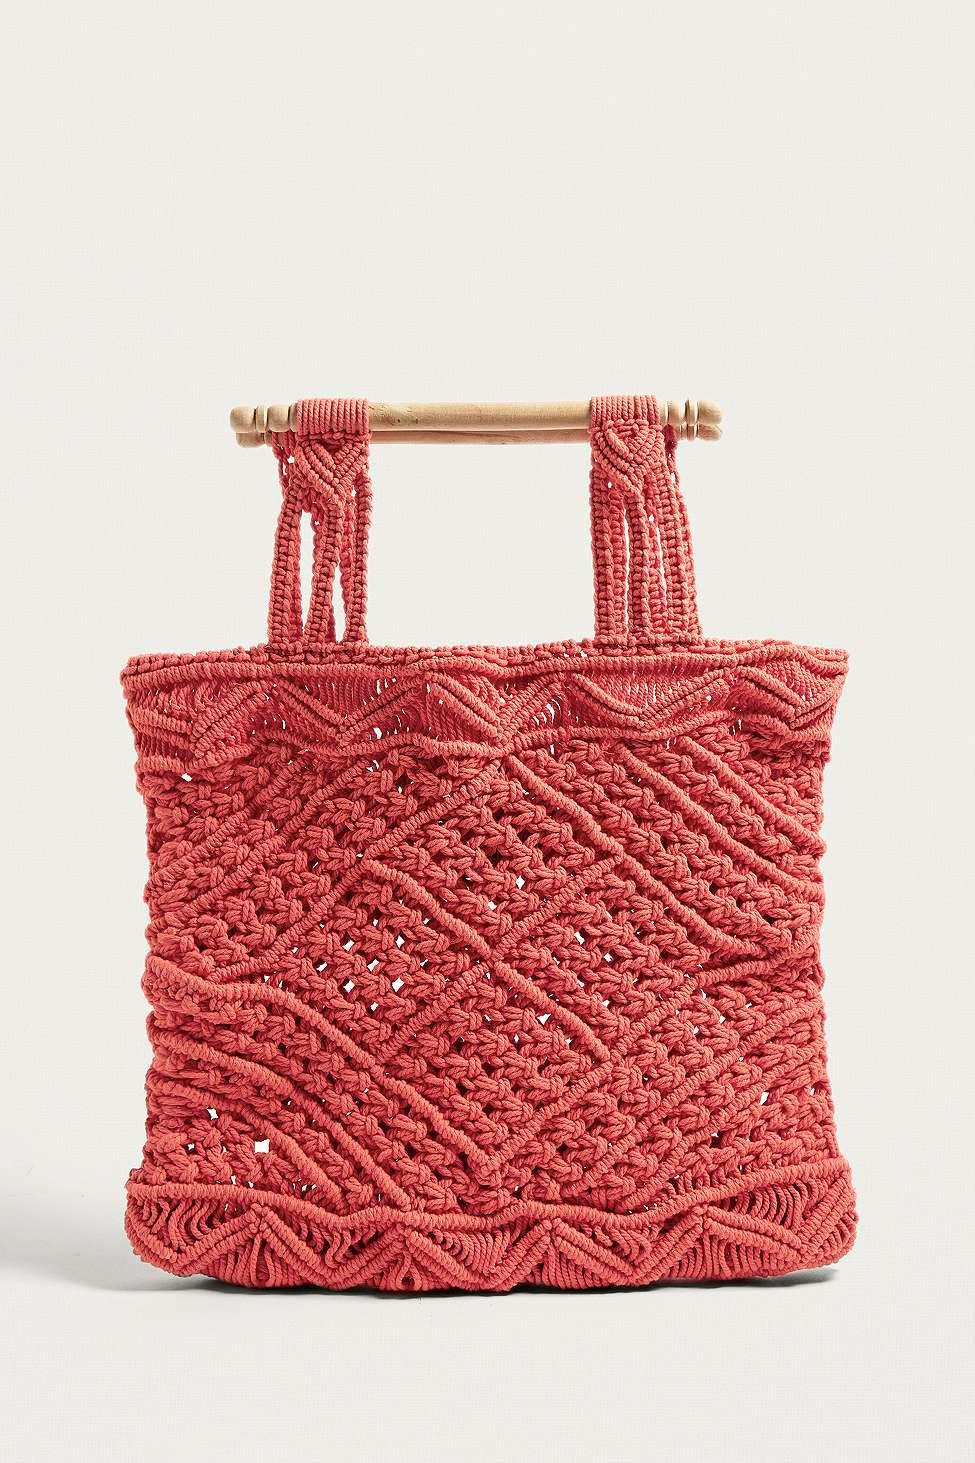 LF Markey Red Macrame Bag, Red